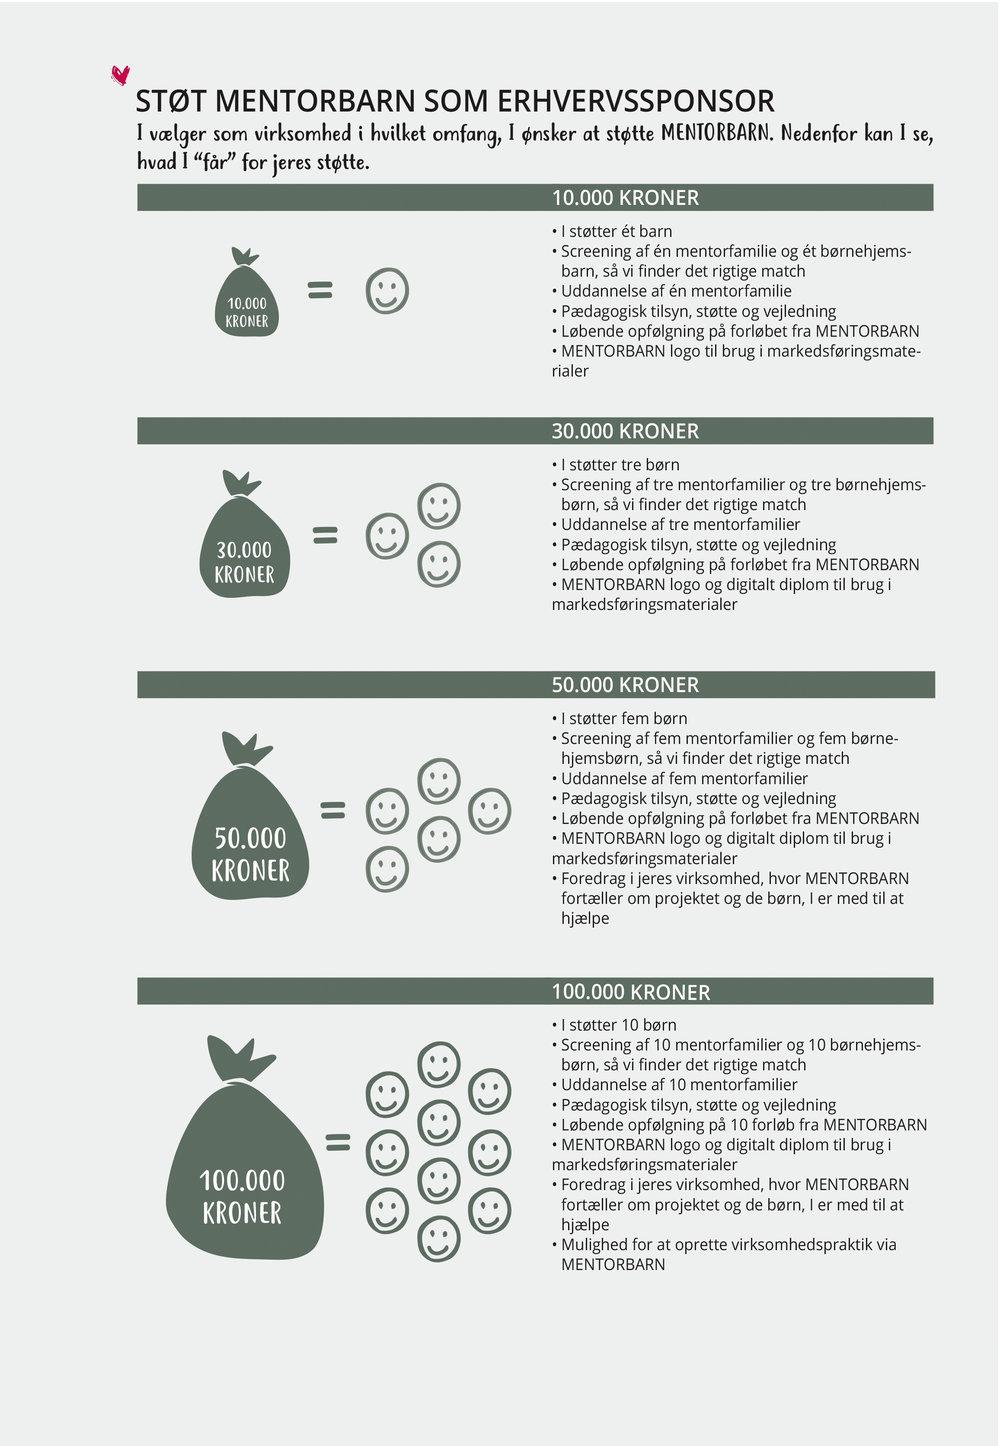 Erhvervssponsorat 2.jpg